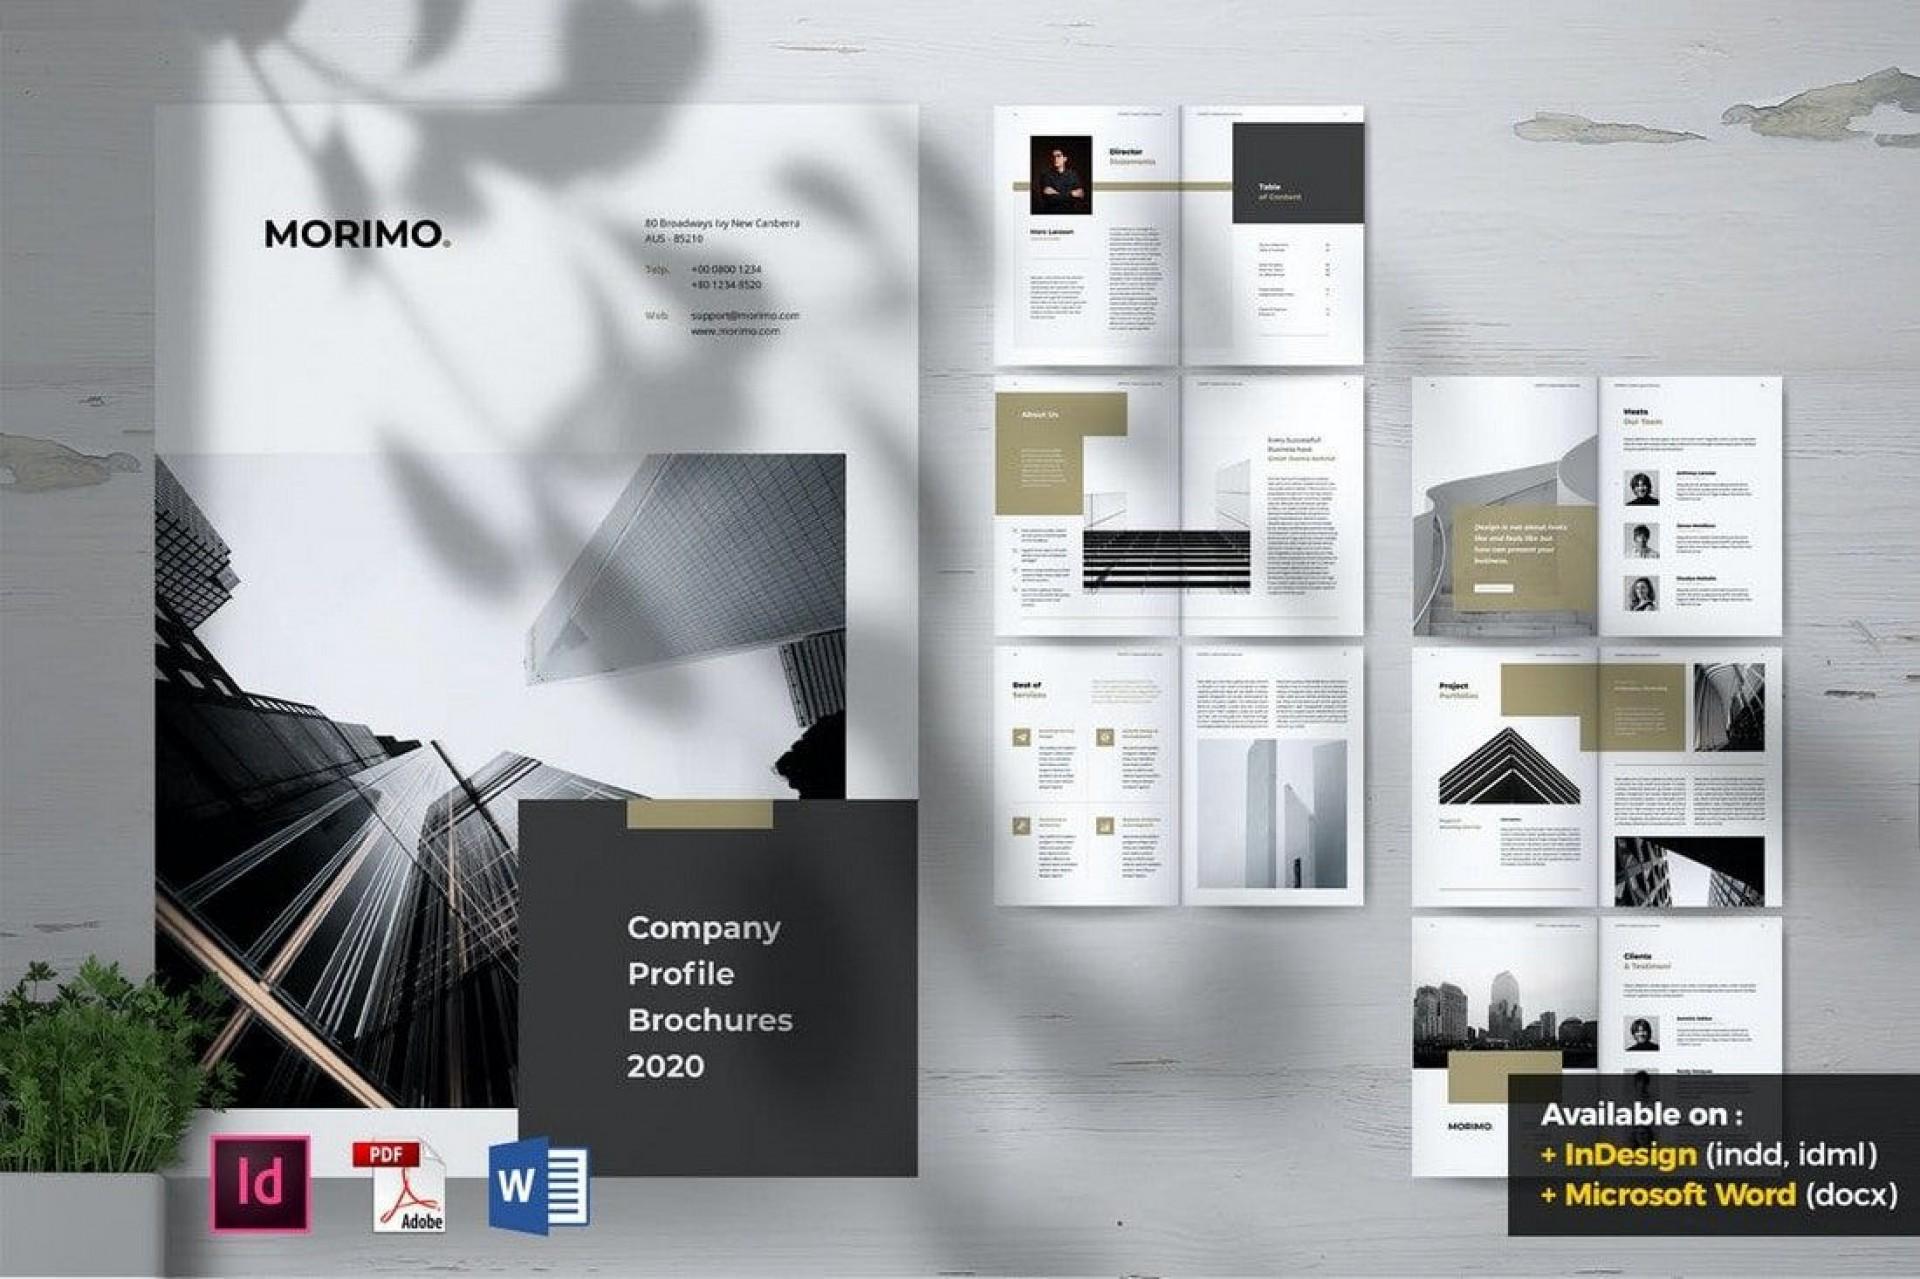 009 Unusual M Word Brochure Template Free Inspiration  Microsoft Tri Fold Download1920